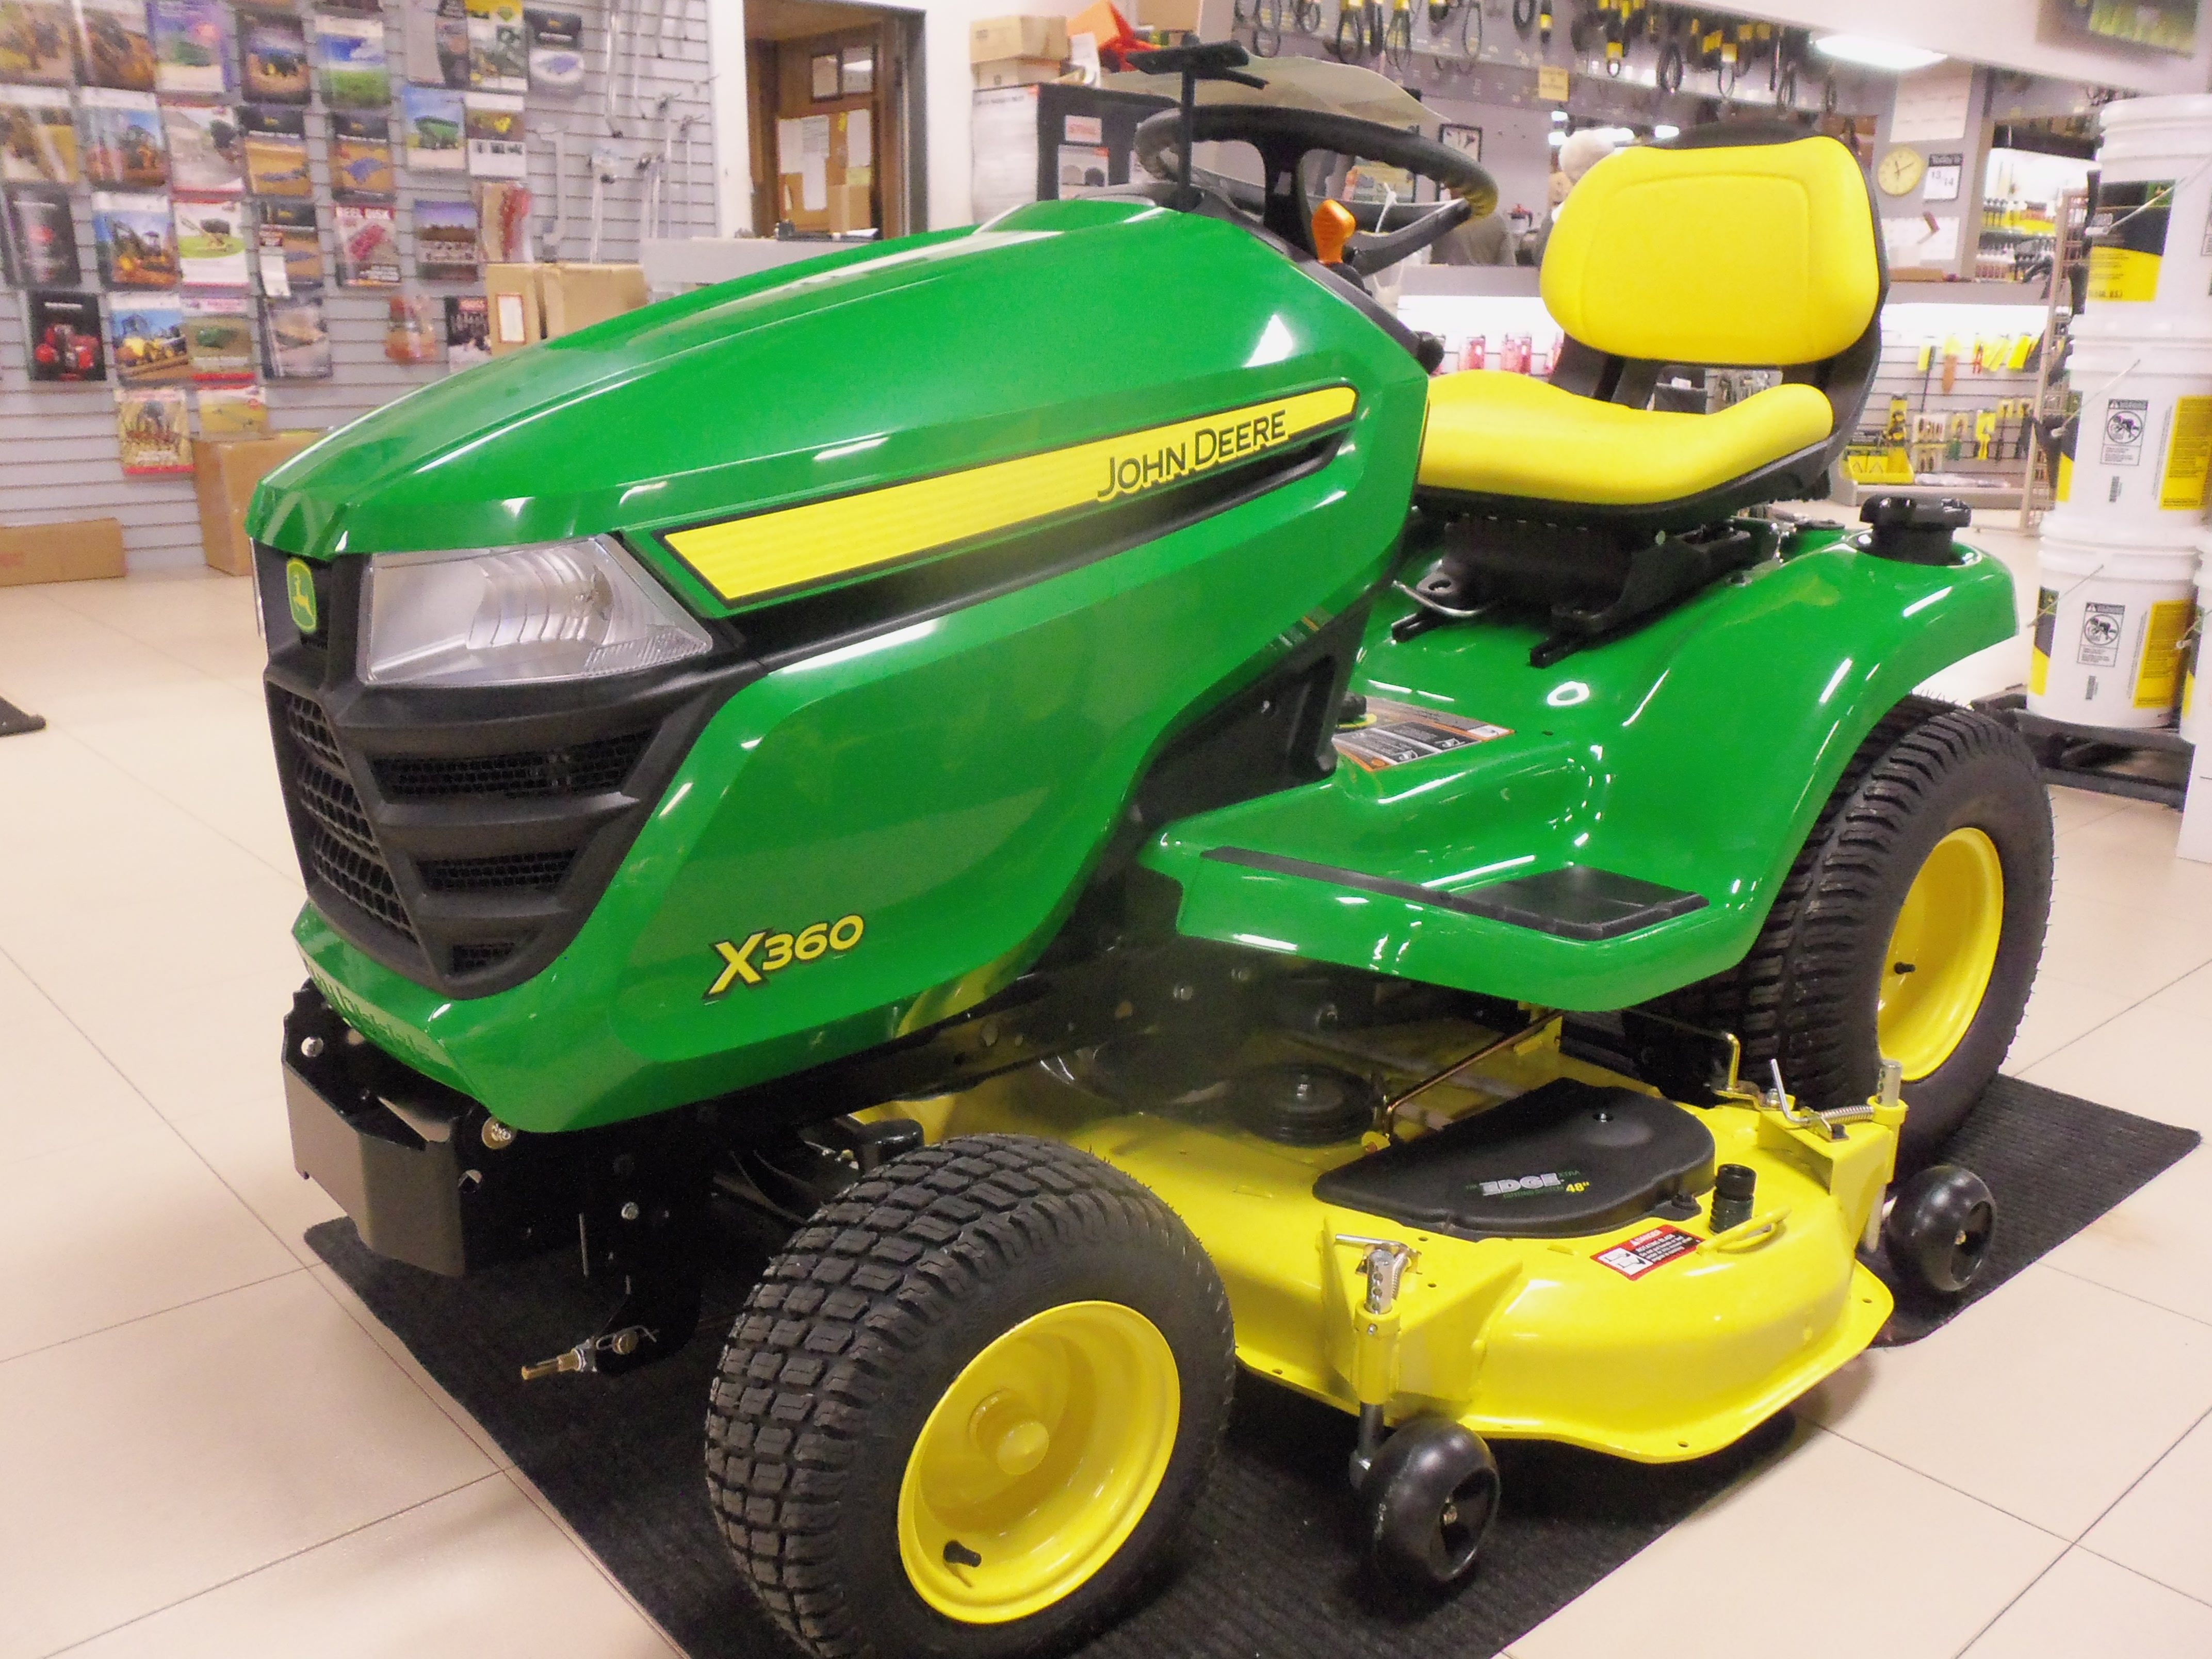 john deere x360 lawn tractor john deere equipment pinterest rh pinterest  com John Deere X300 Operators Manual John Deere X300 Operators Manual